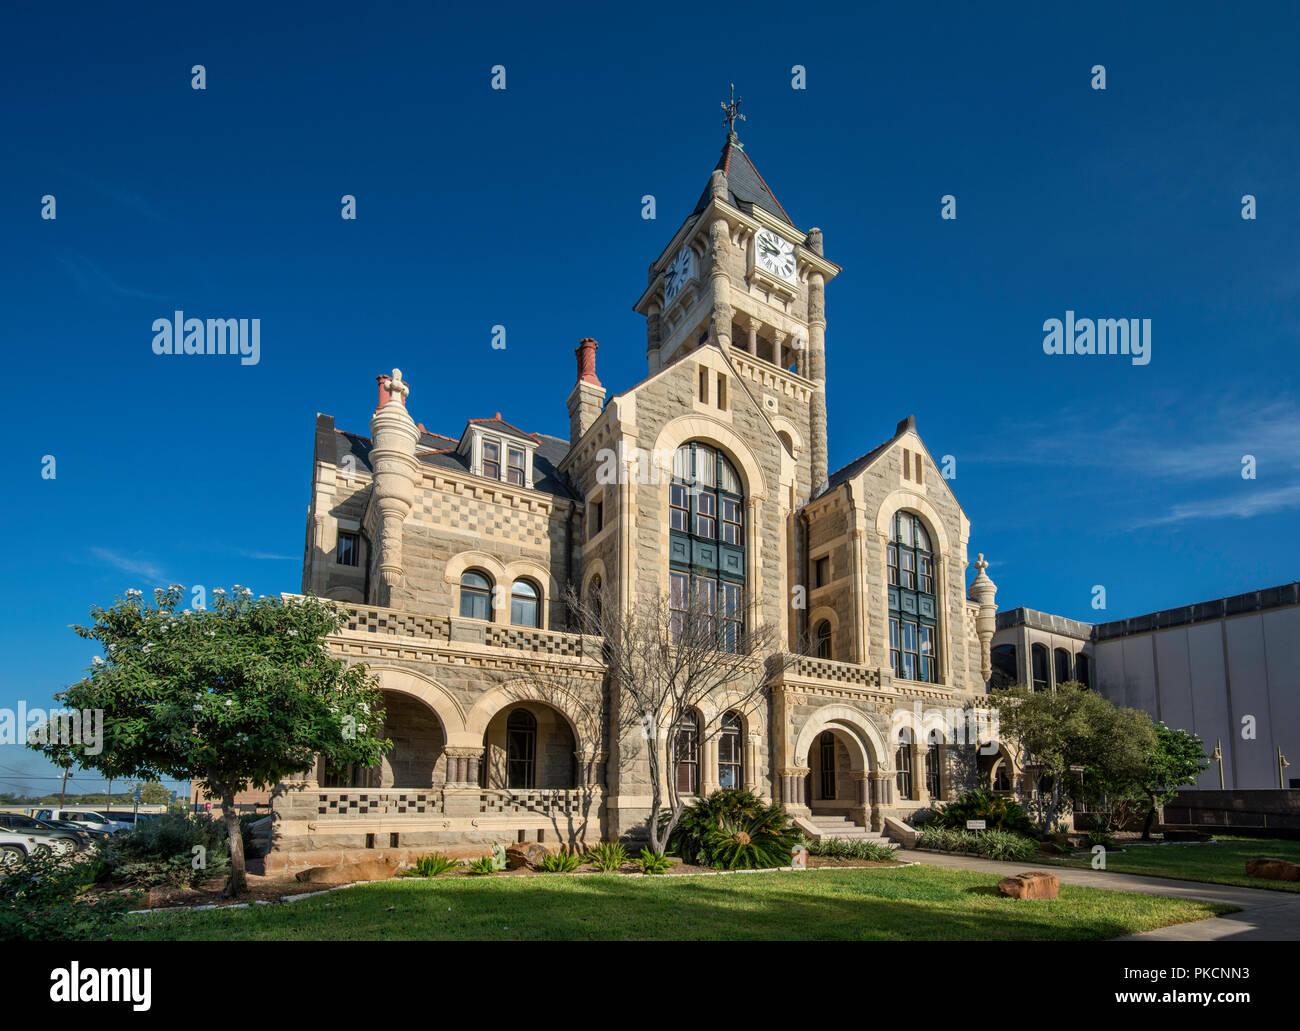 Victoria County Courthouse (1892), Romanesque Revival style, at De Leon Plaza, Victoria, Texas, USA - Stock Image